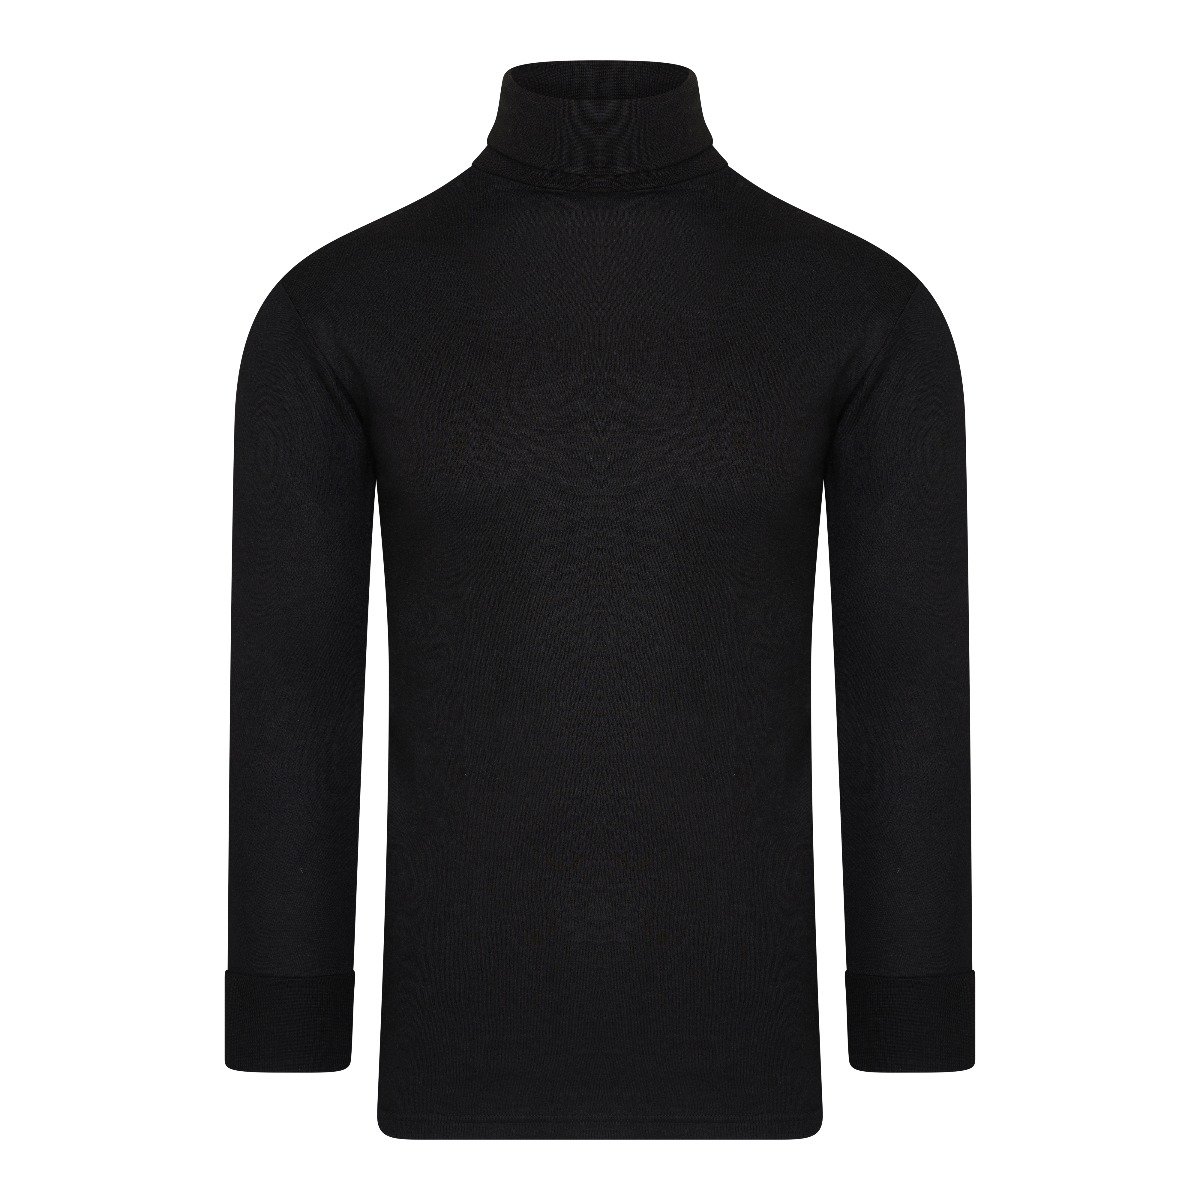 Beeren Thermo Unisex Shirt Col Lange Mouw Zwart L